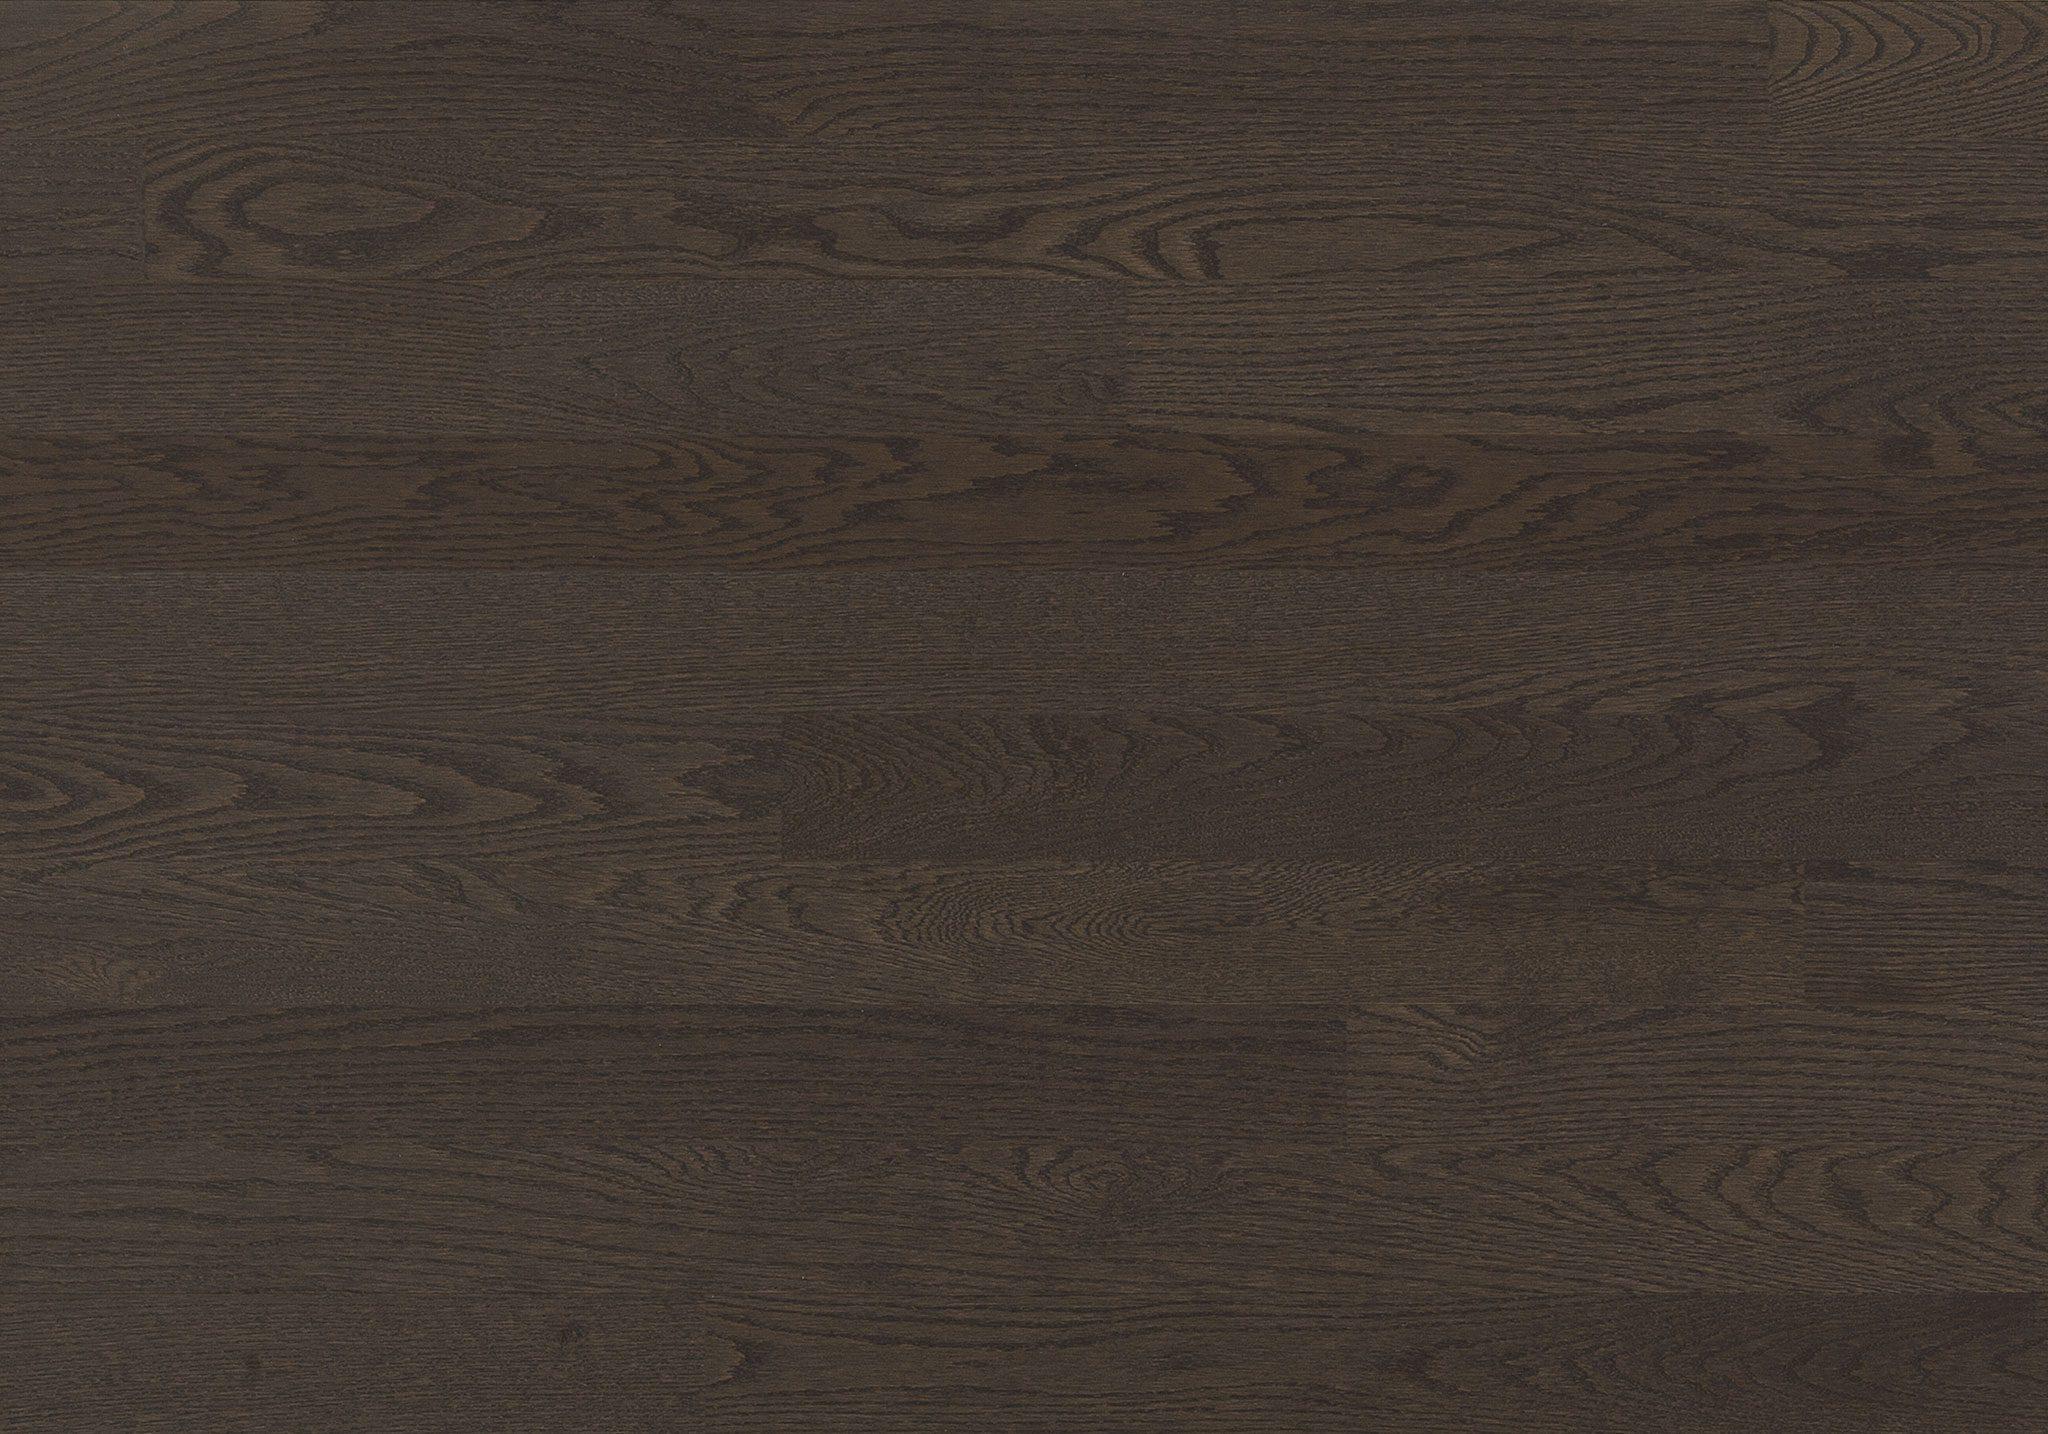 Red Oak Graphite Solid Width: 3 1/4